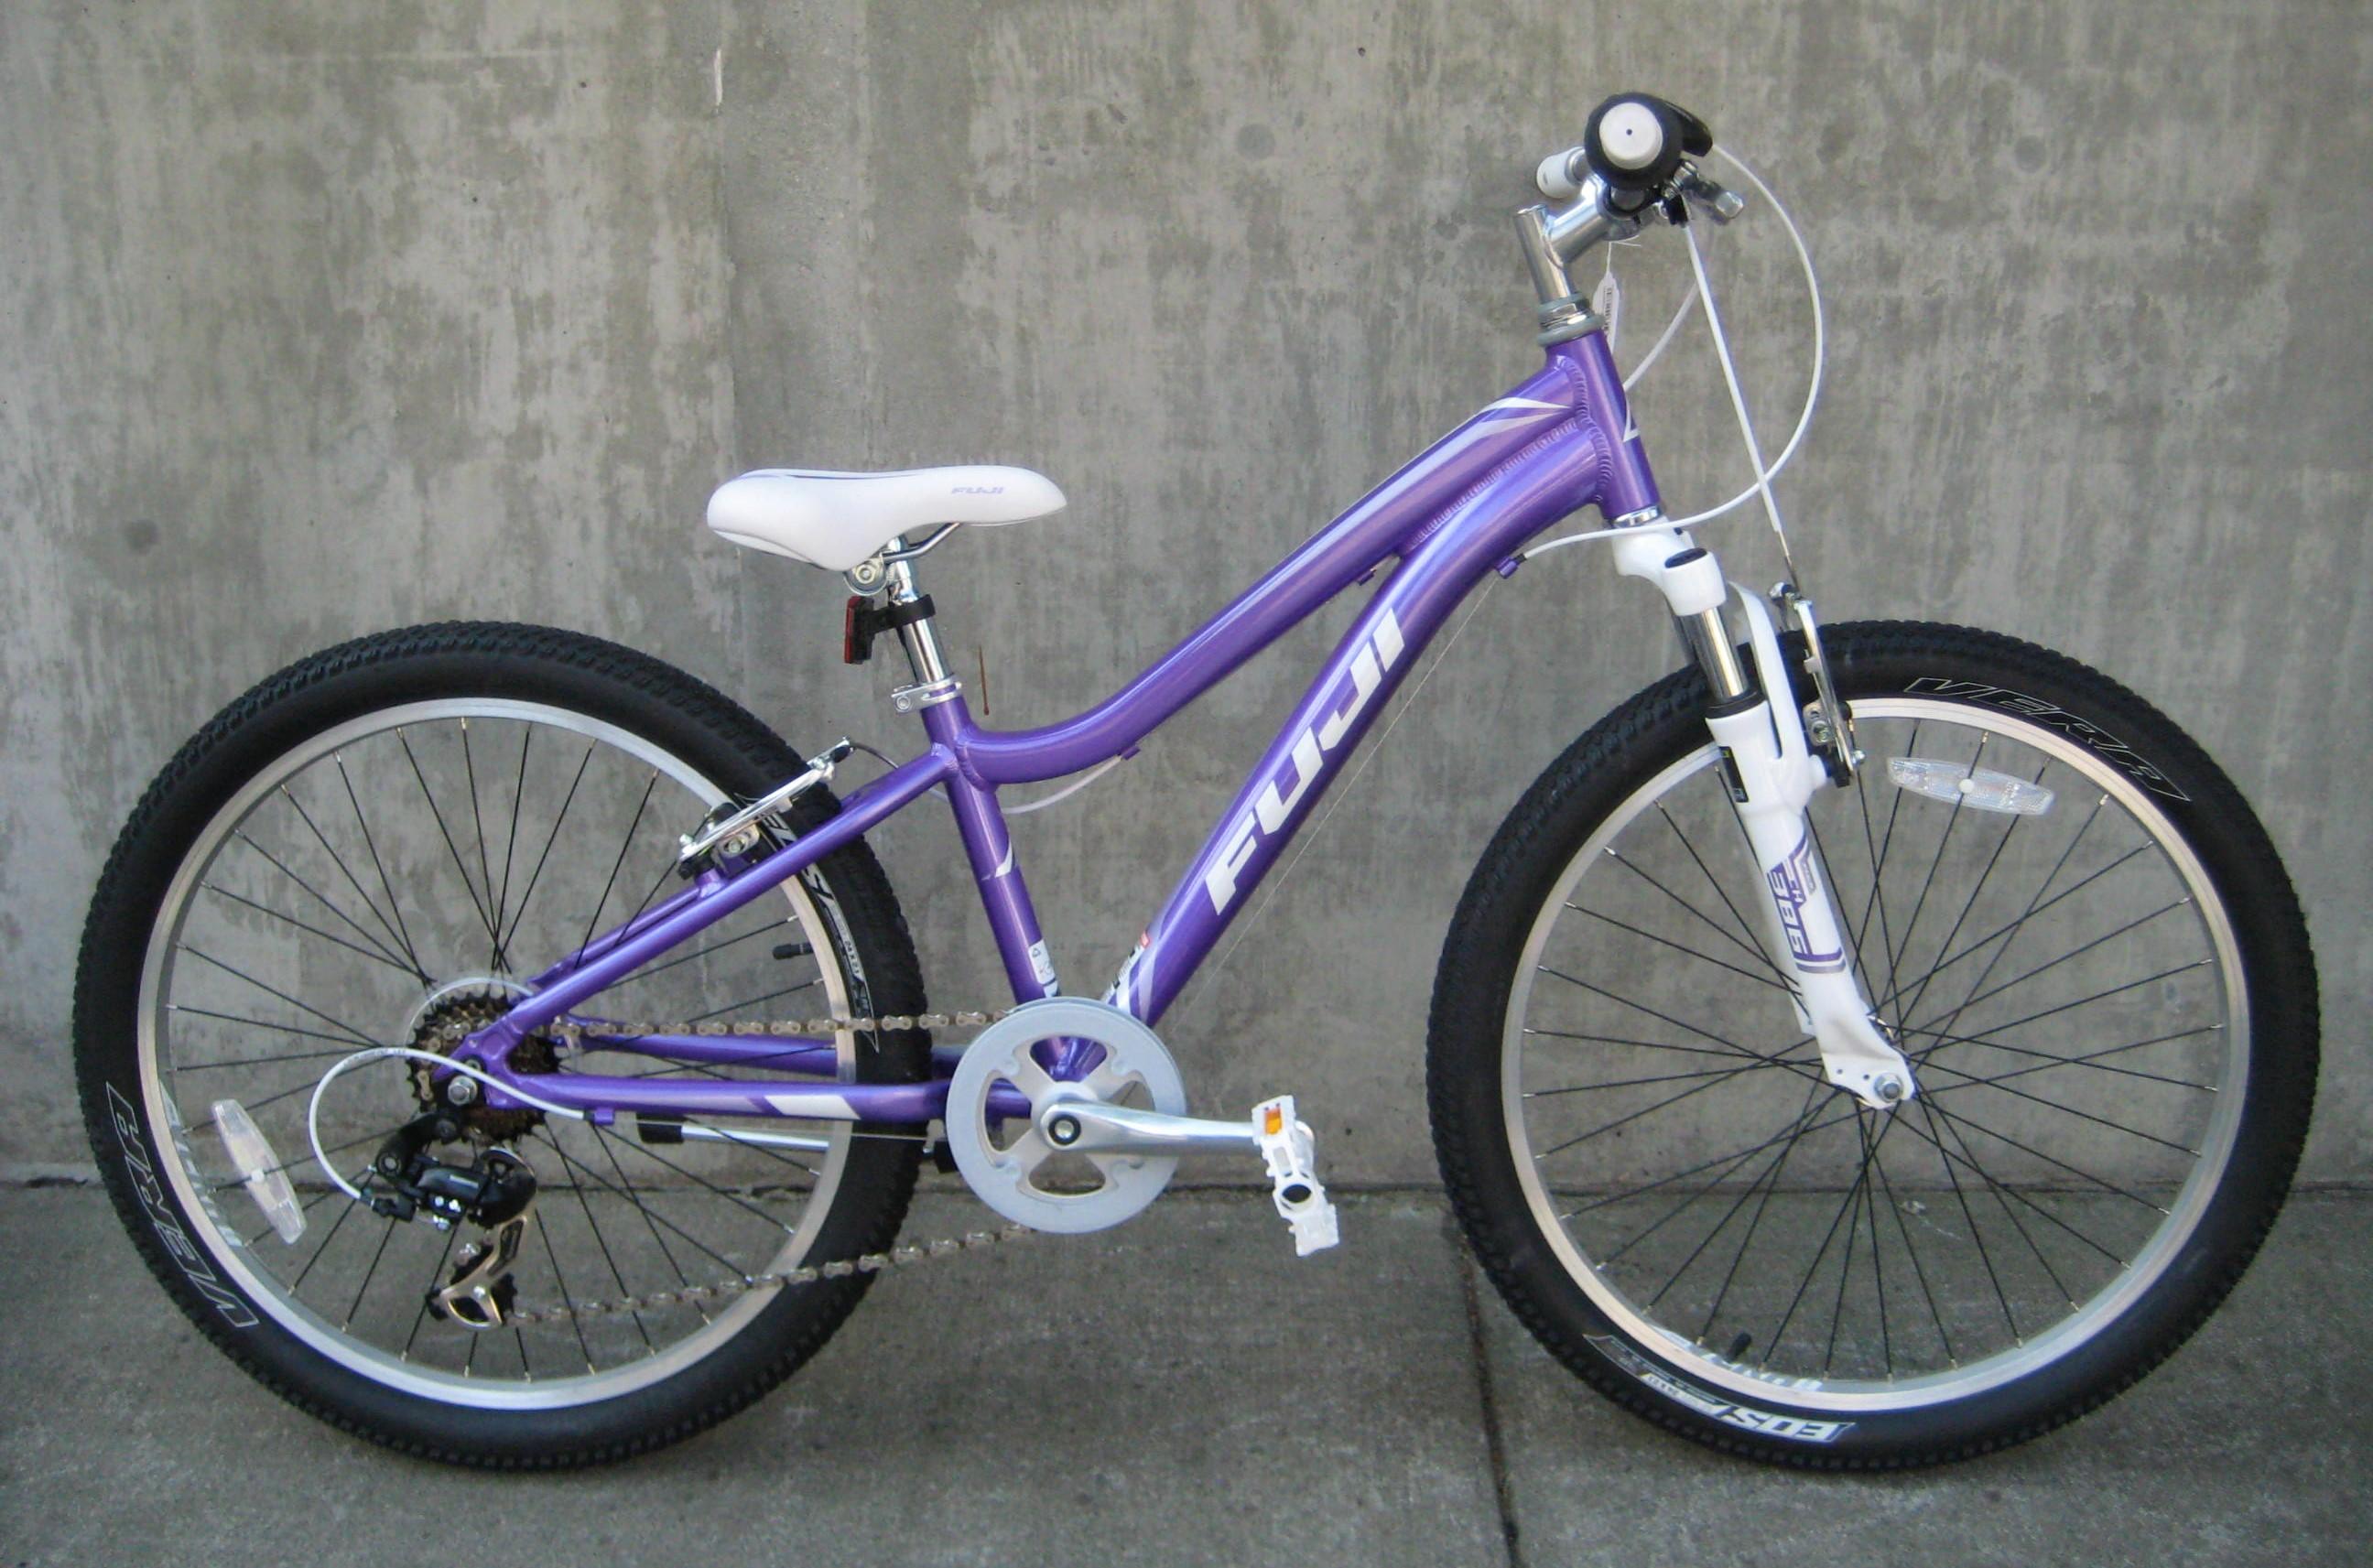 Fuji Dynamite 24 Kids Bike At Classic Cycle Bainbridge